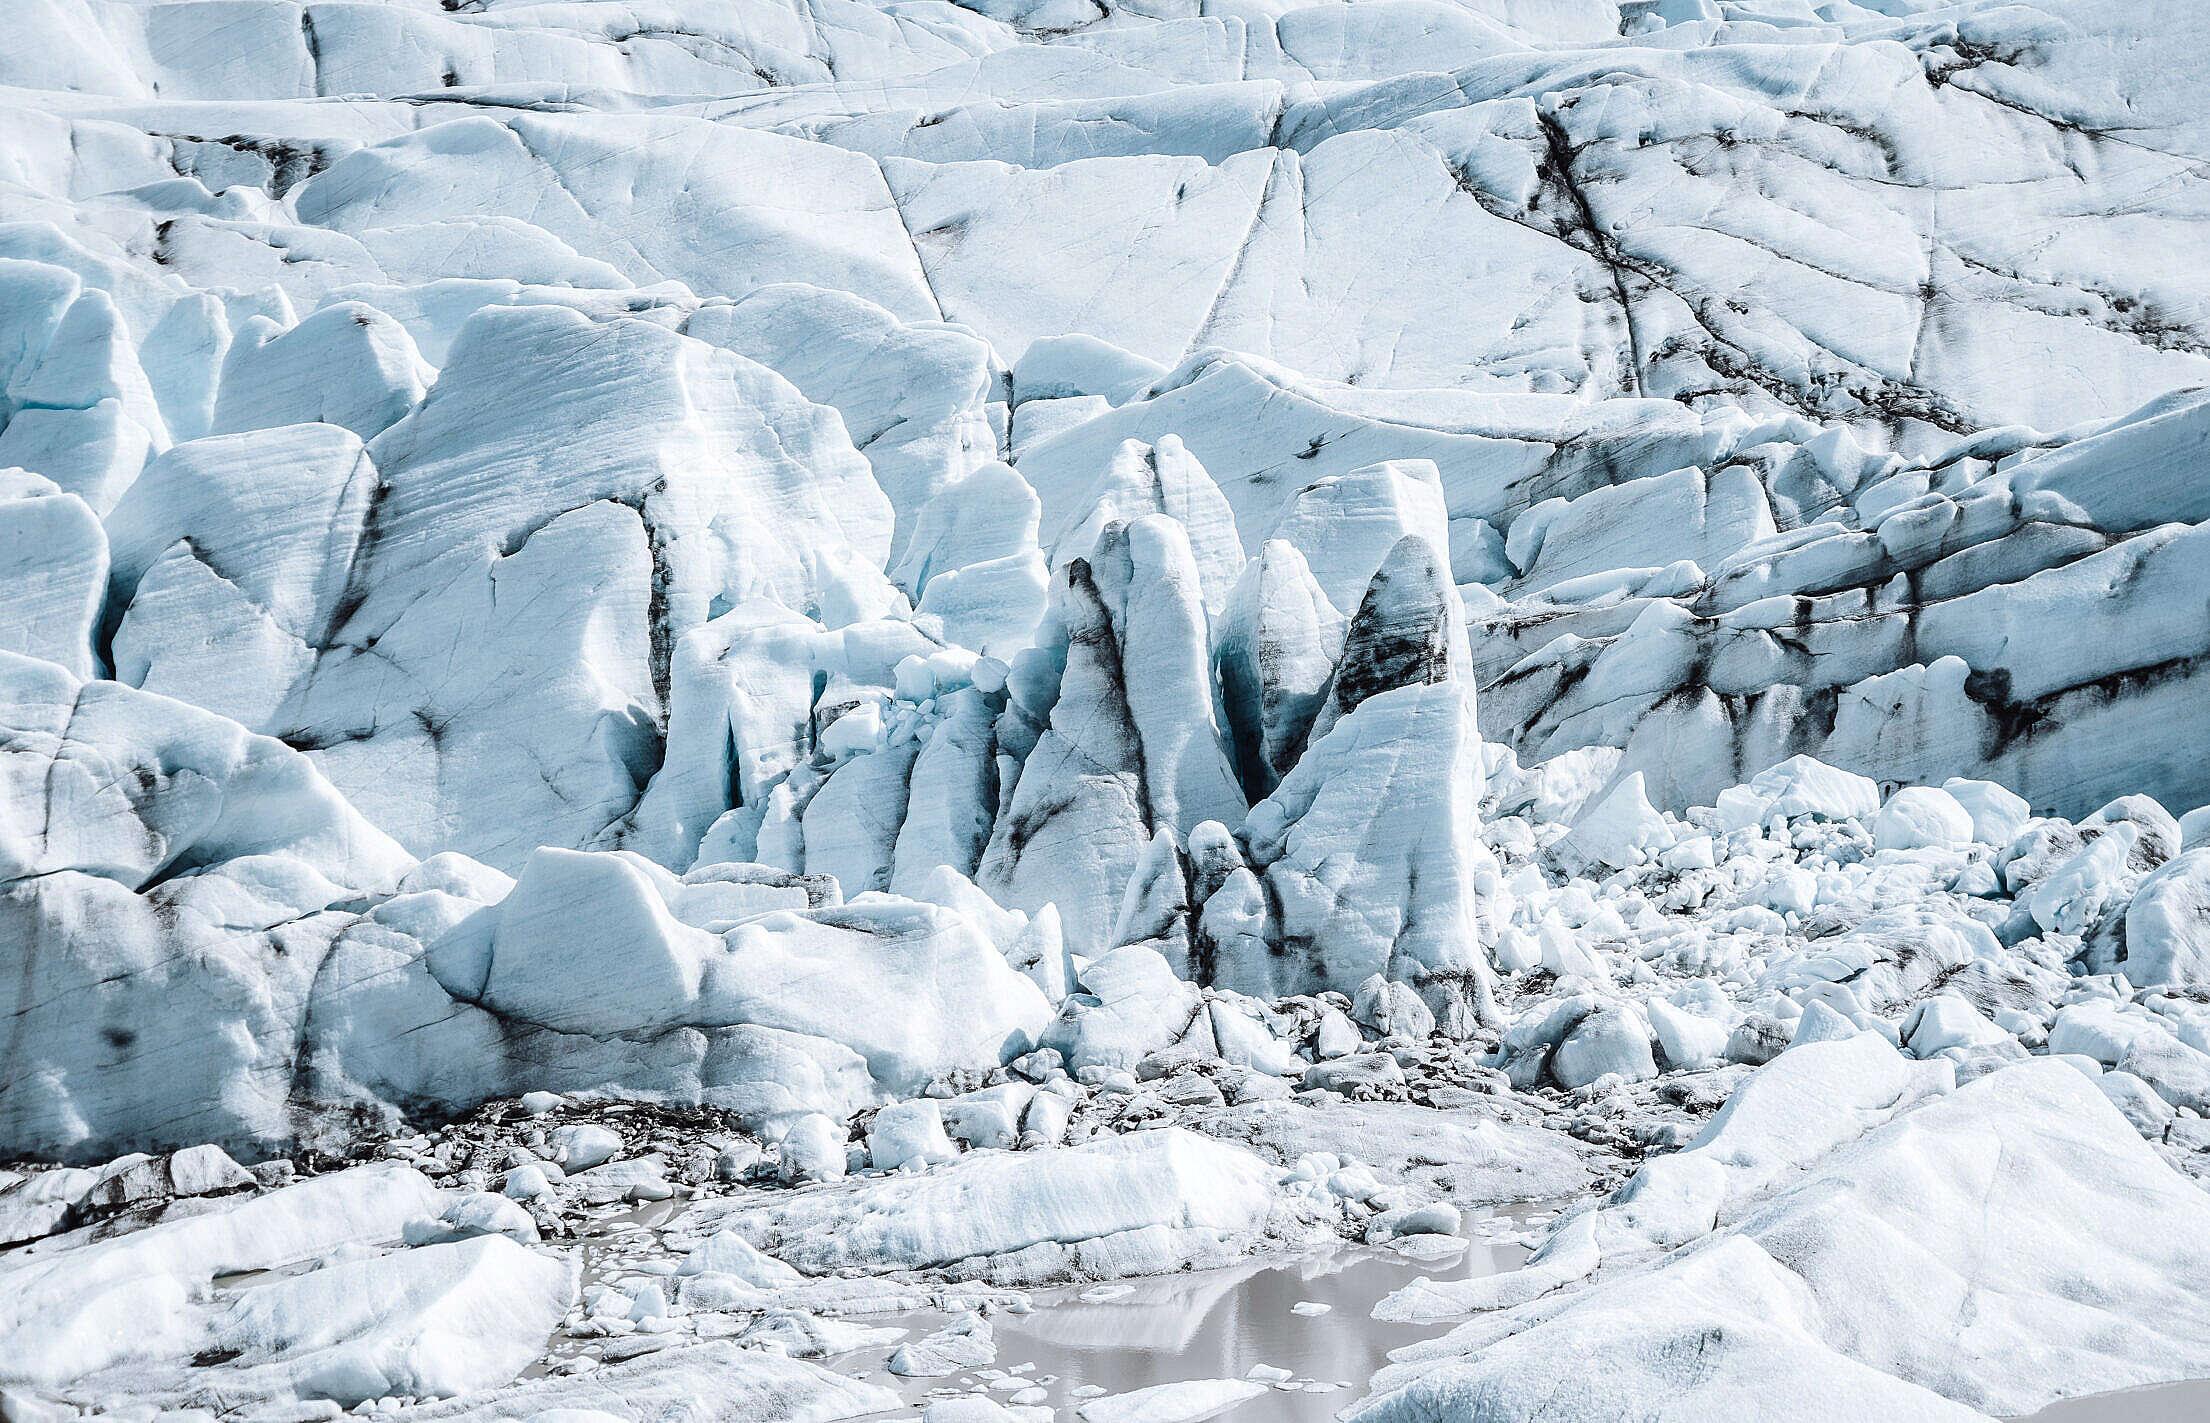 Big Glacier in Iceland Free Stock Photo